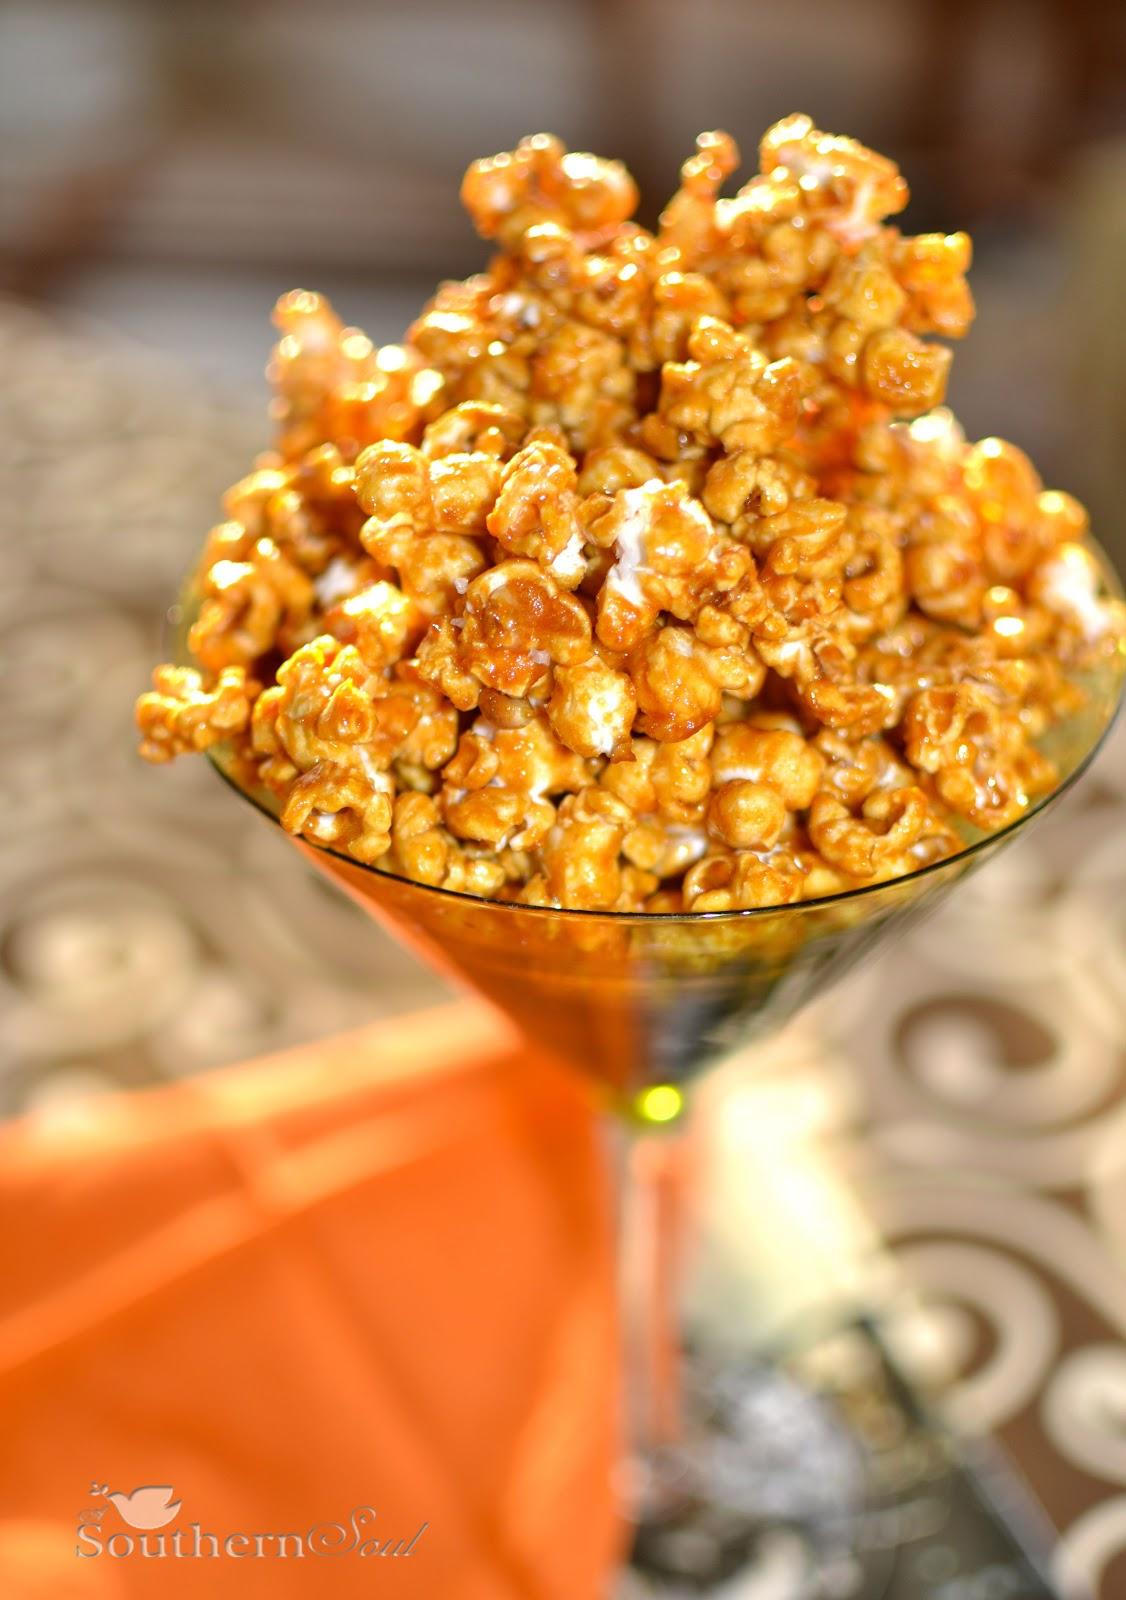 A Southern Soul: Caramel Corn with Sea Salt